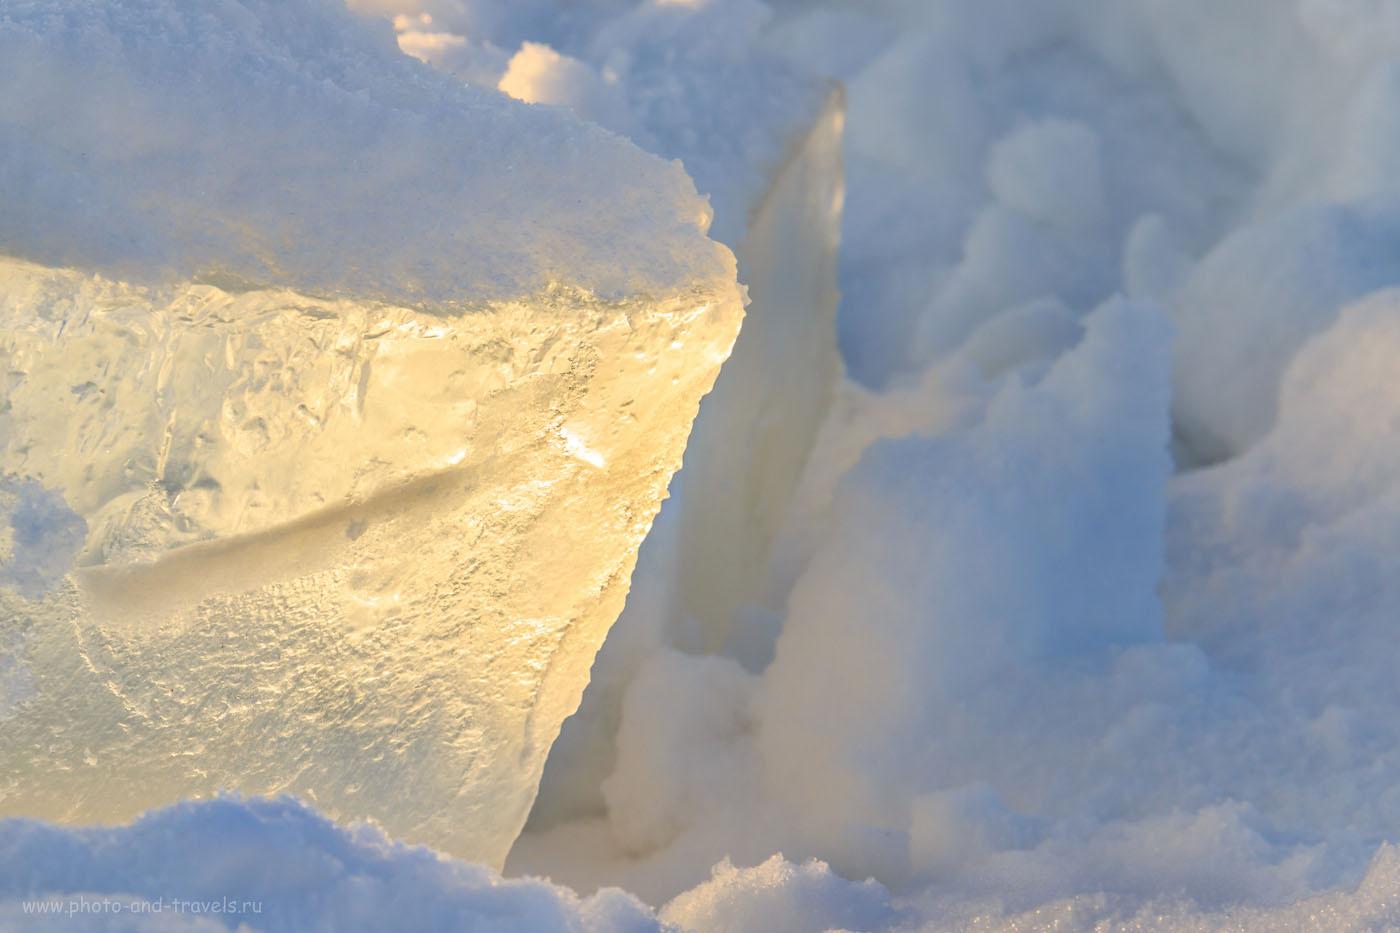 Фотография 22. Лед на реке. Как я тестировал Canon Kit. 1/200, +0.67, 9.0, 100, 75.